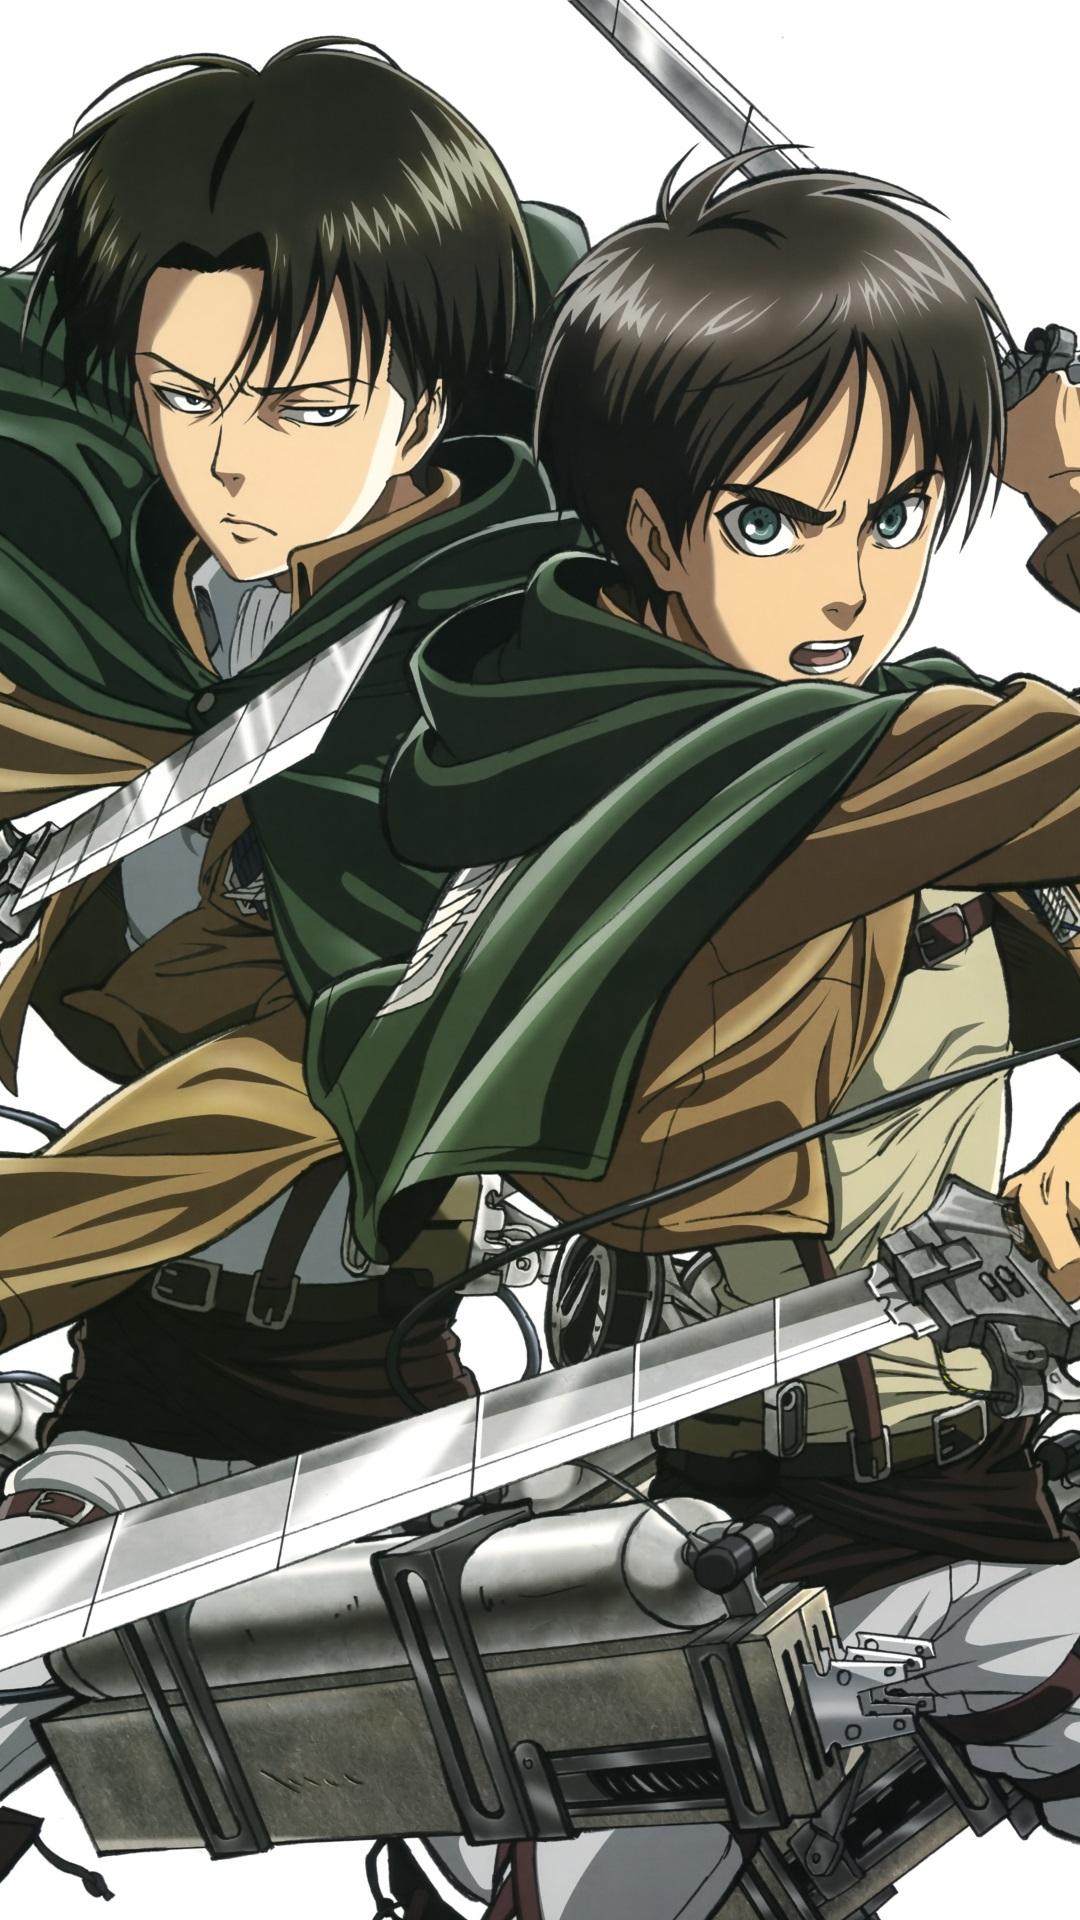 Shingeki No Kyojin Attack On Titan Wallpaper Iphone Levi 1080x1920 Wallpaper Teahub Io